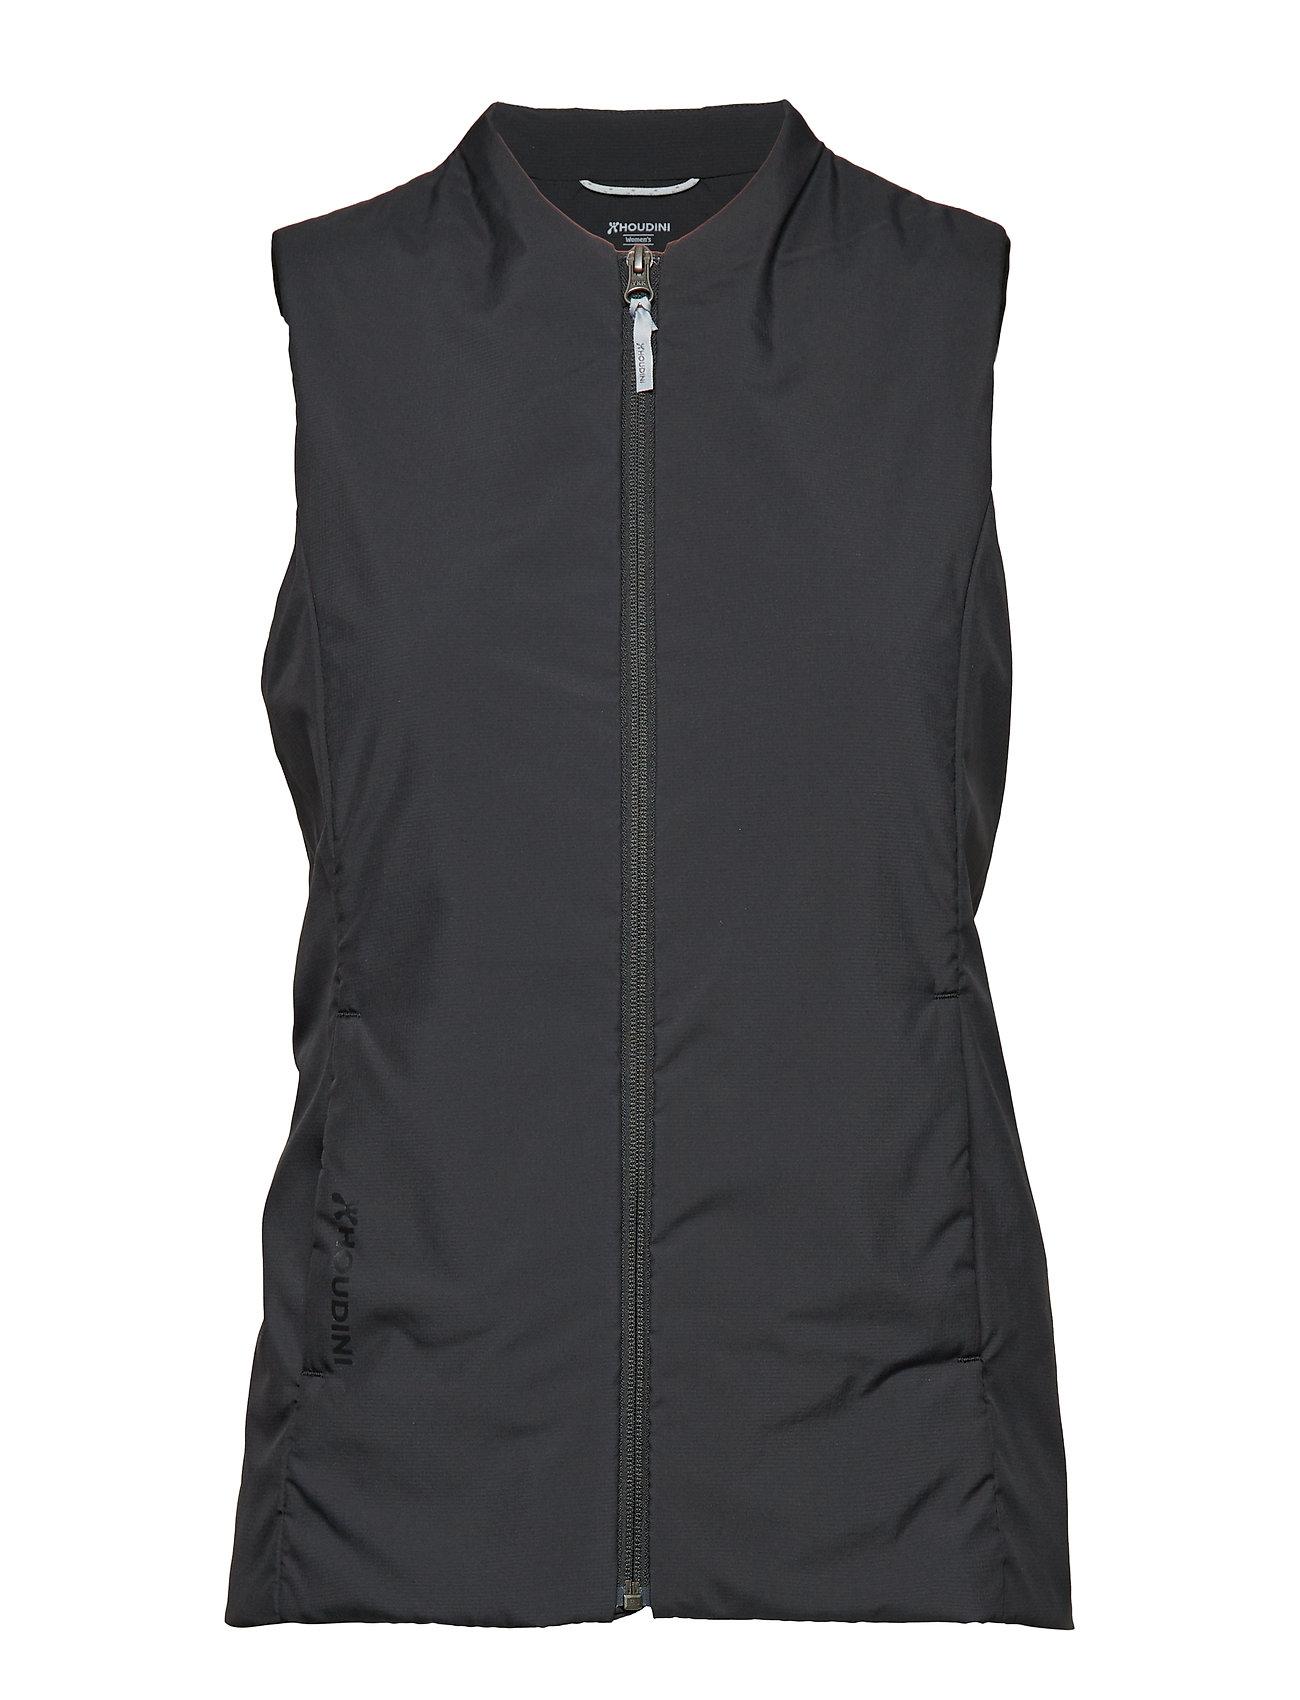 Houdini W's Venture Vest - TRUE BLACK